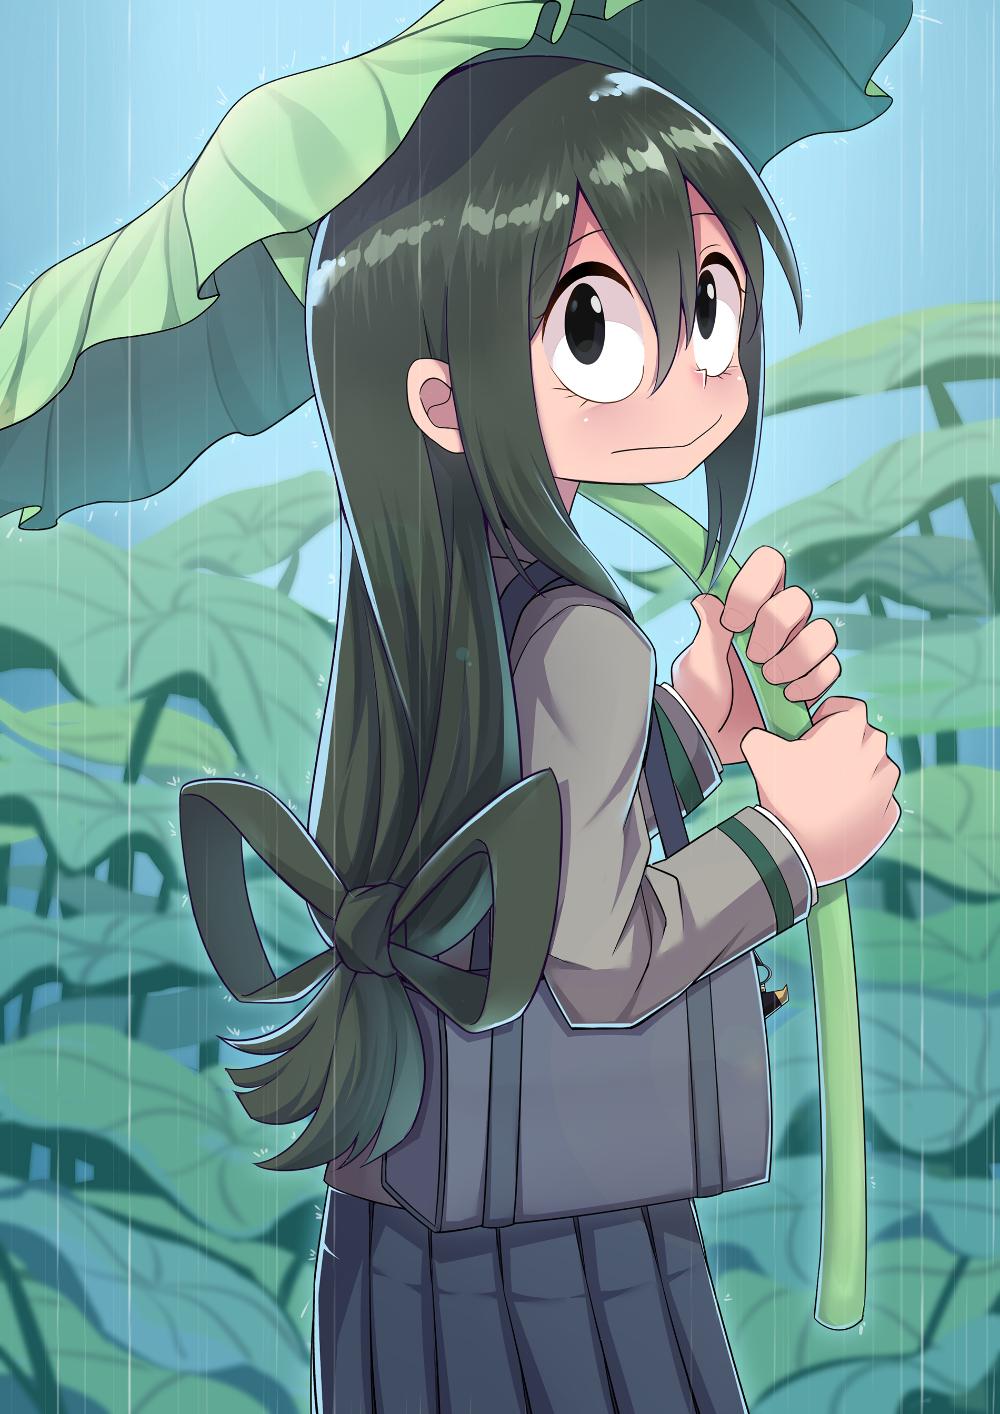 Tsuyu Asui My Hero Academia Rainy Season 梅雨 Pixiv カワイイアニメ 可愛いイラスト かわいいアニメの女の子